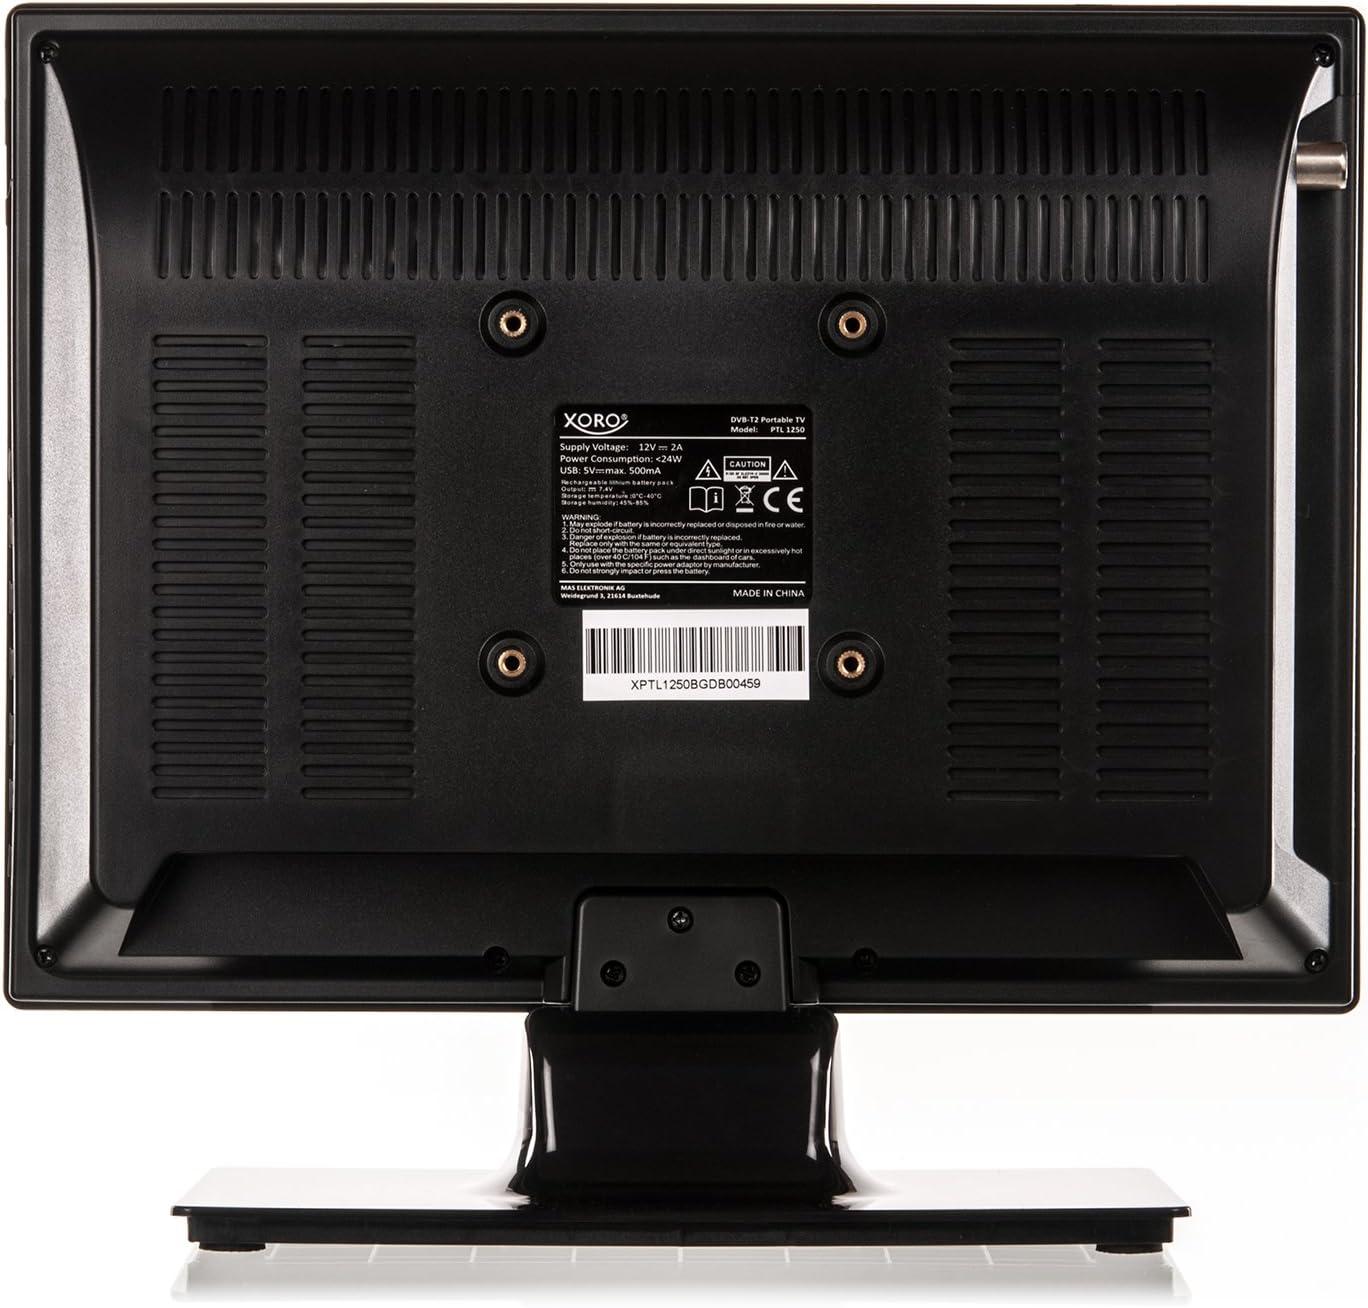 Xoro PTL 1250 31.8 cm 12,5 DVB-T/T2 portabler TV: Amazon.es: Electrónica